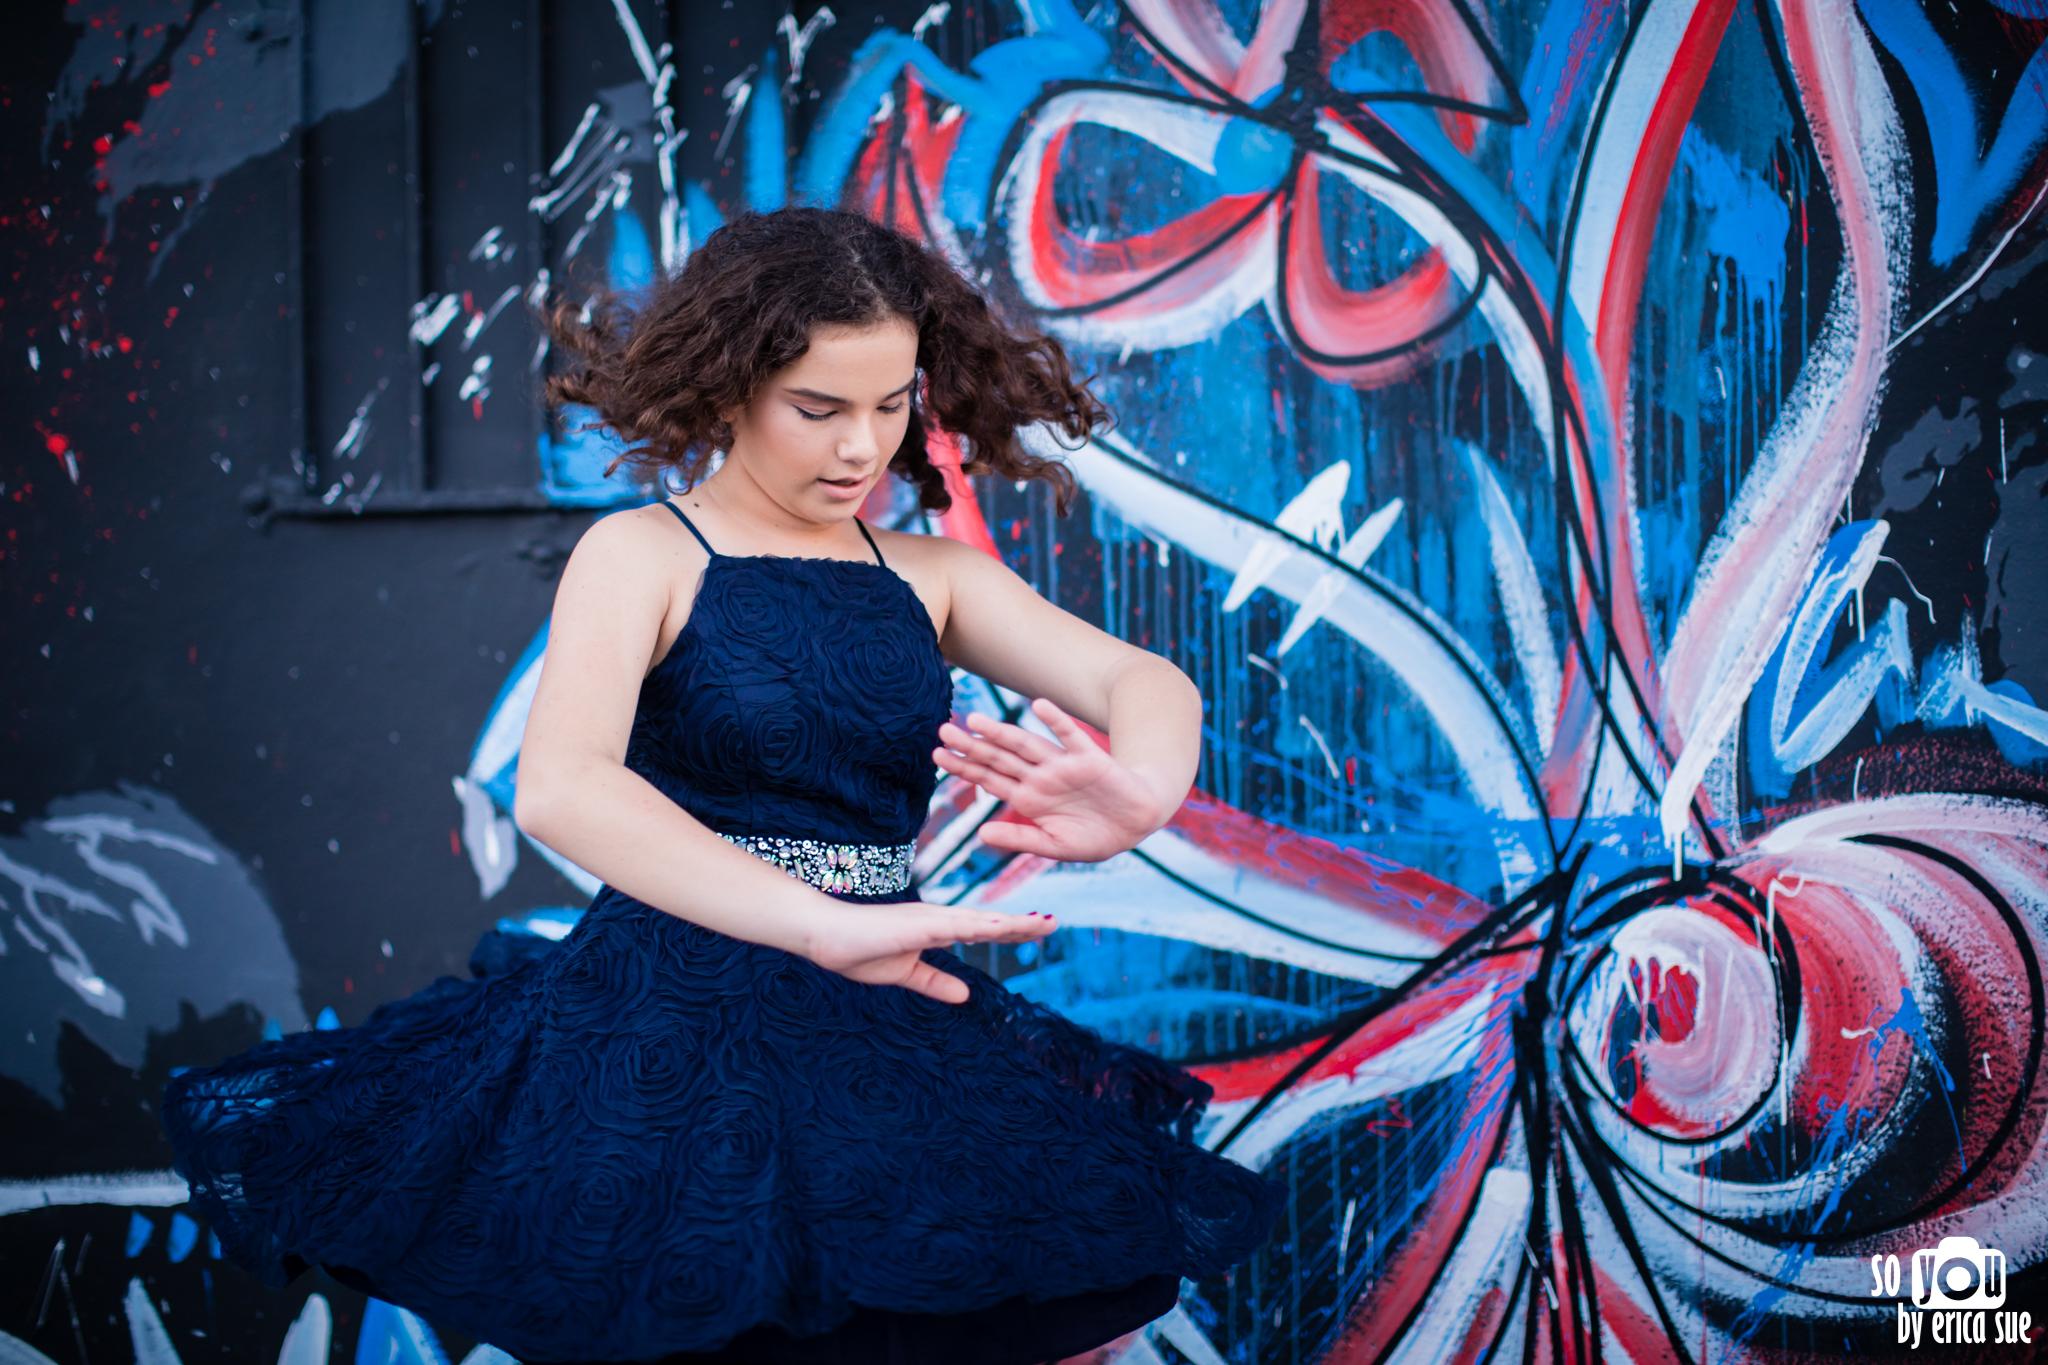 wynwood-photo-shoot-so-you-by-erica-sue-ft-lauderdale-davie-miami-fl-florida-4103.jpg